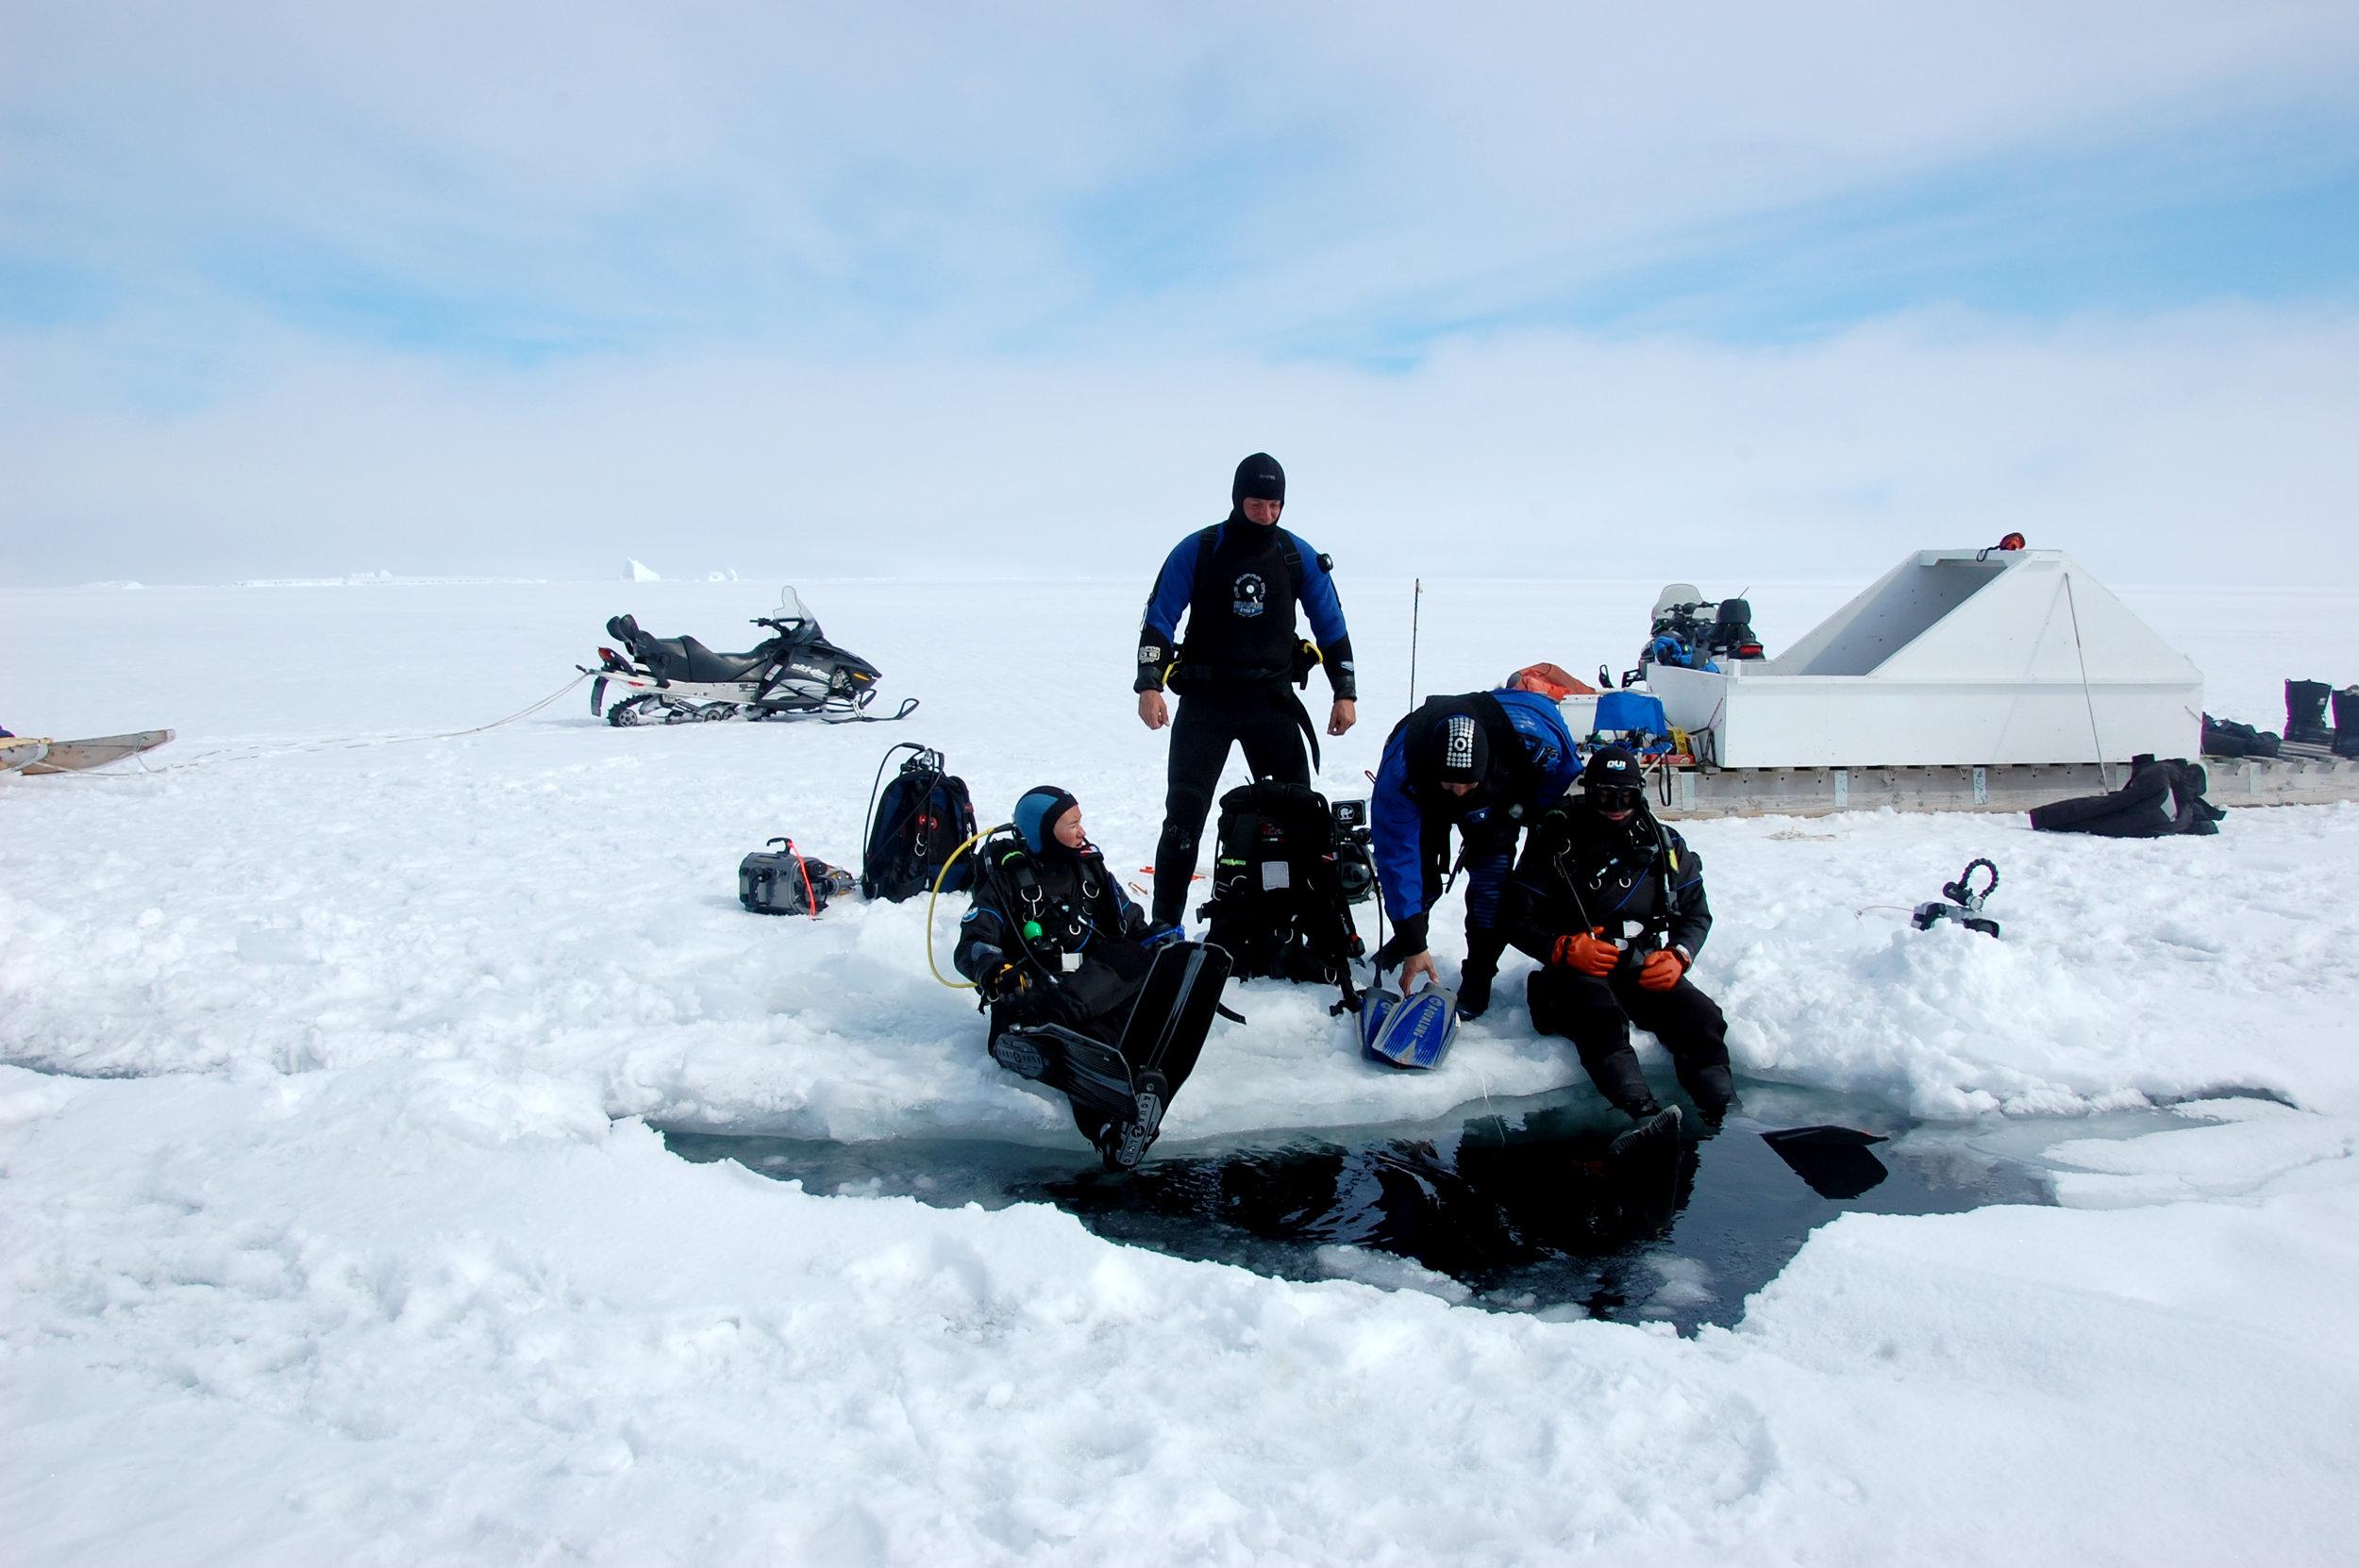 AK_Shore_dive_through_ice_DSC_2237.JPG